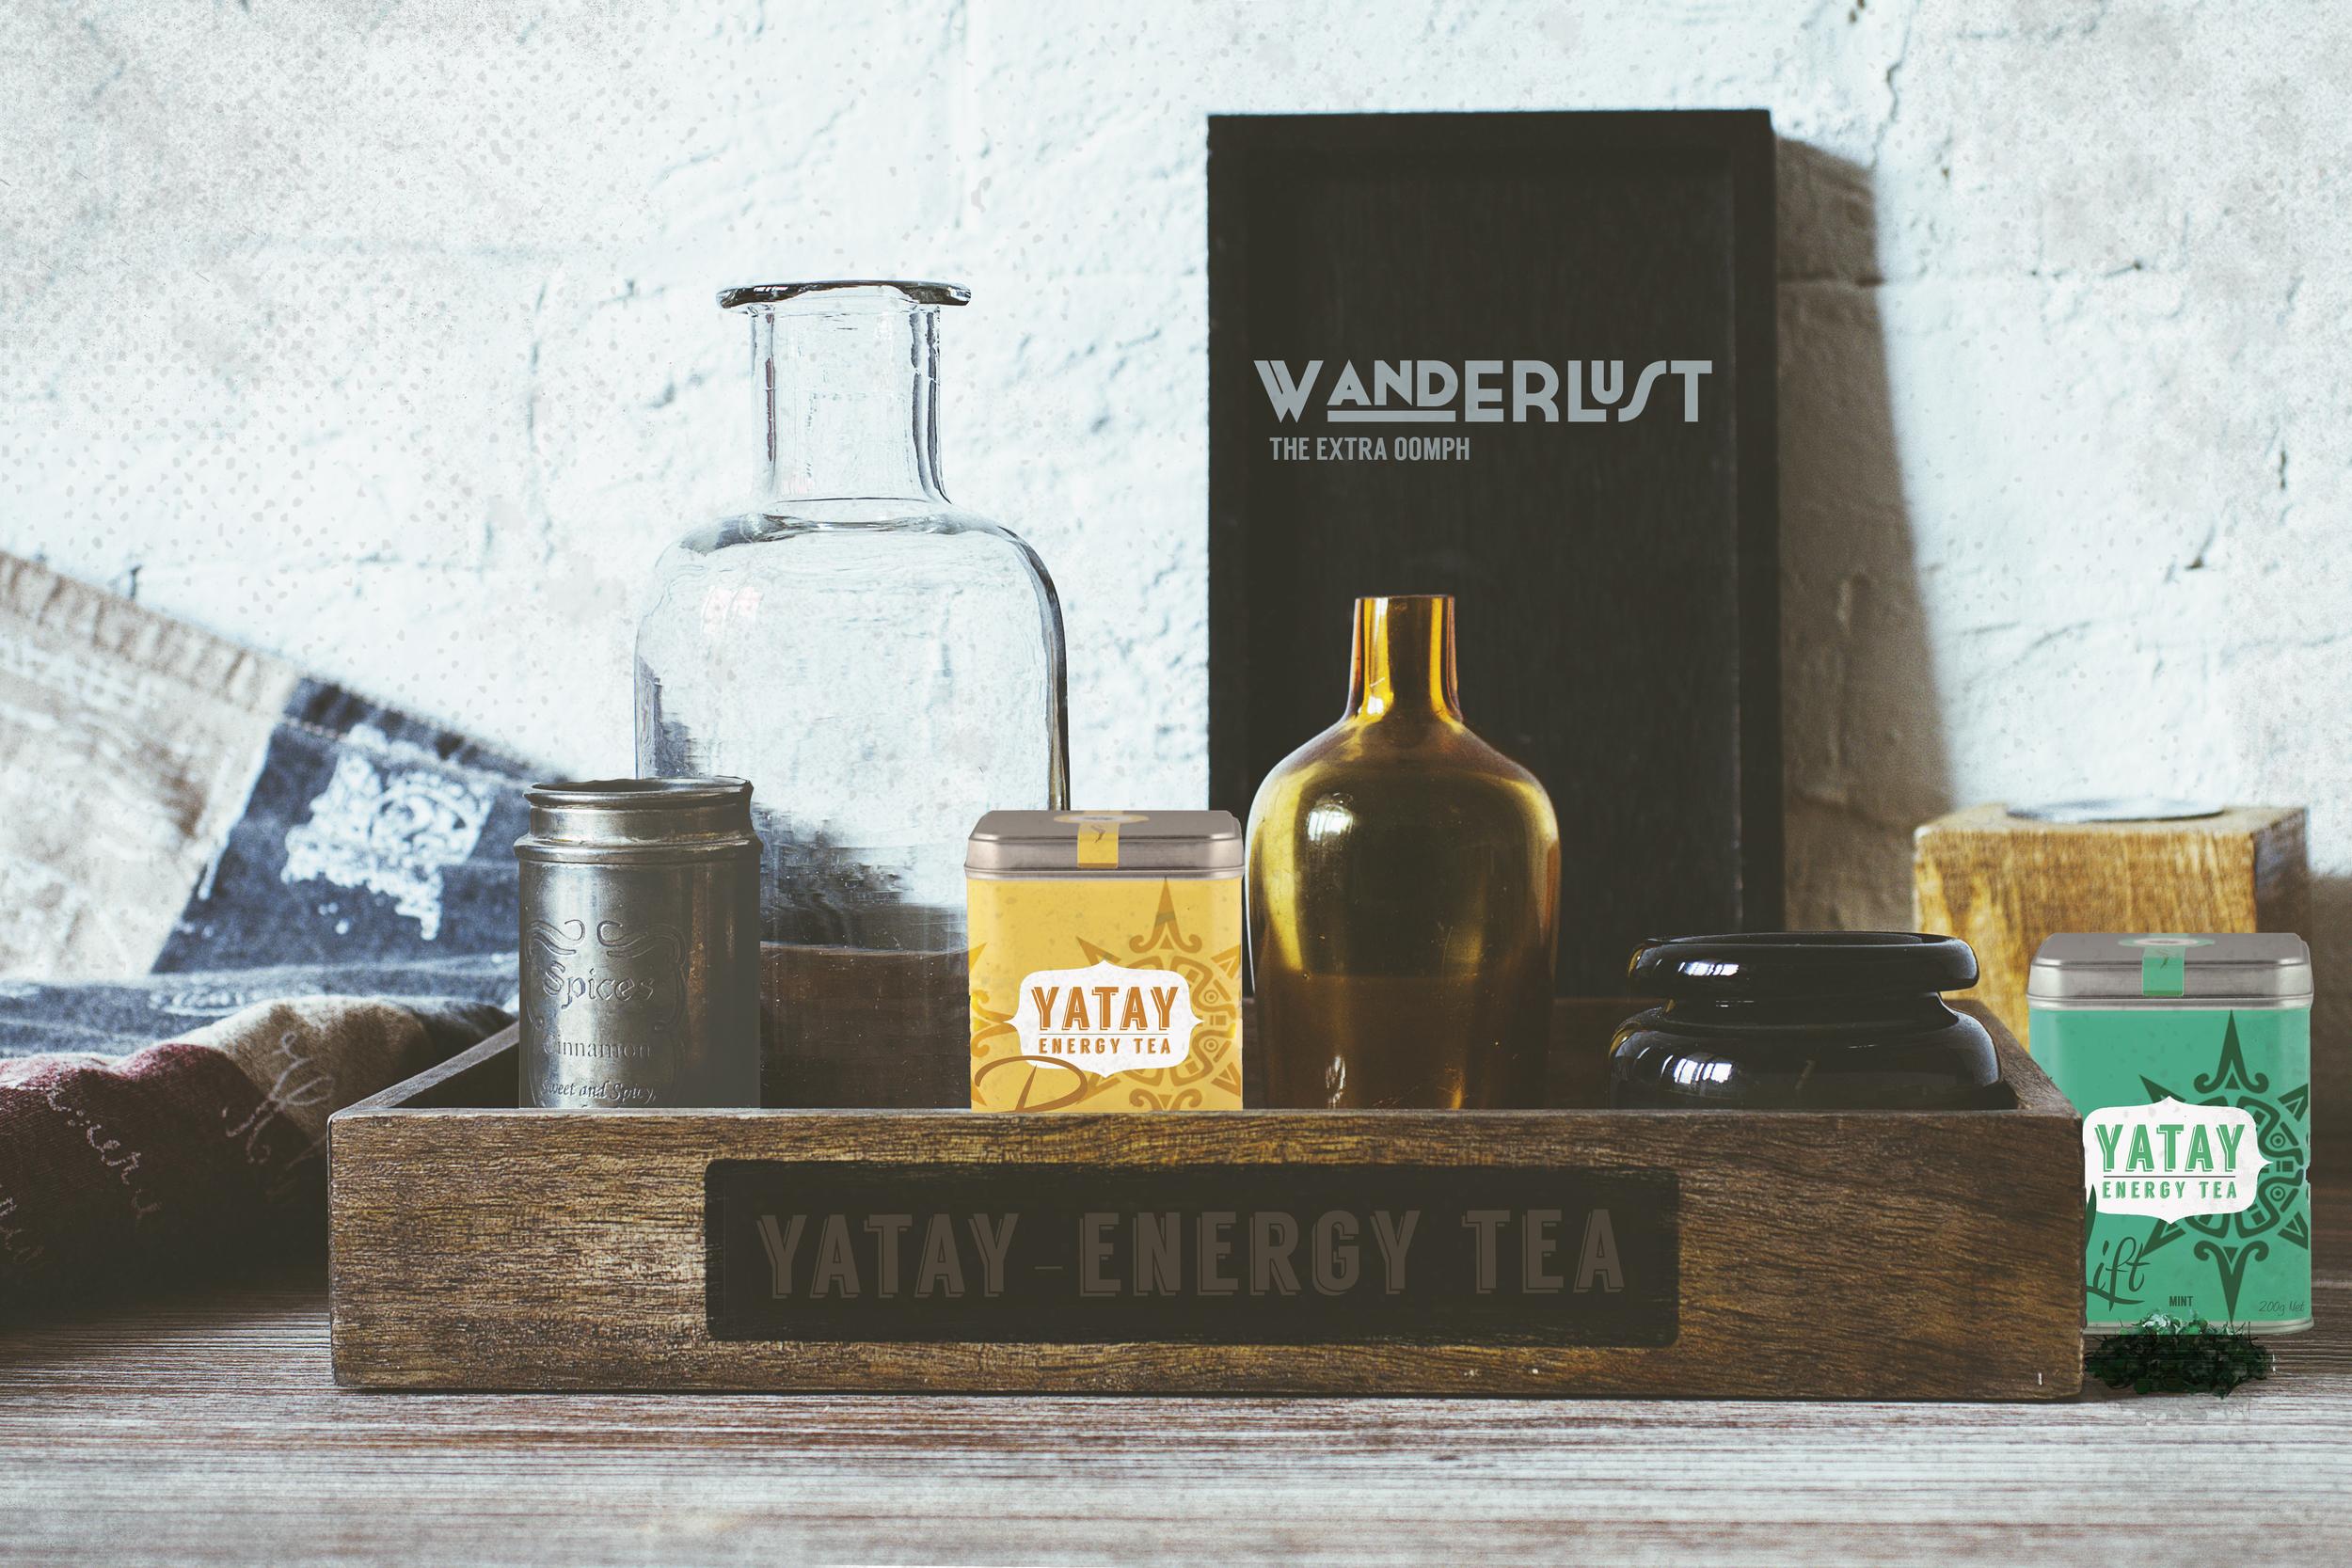 Yatay-energy.jpg